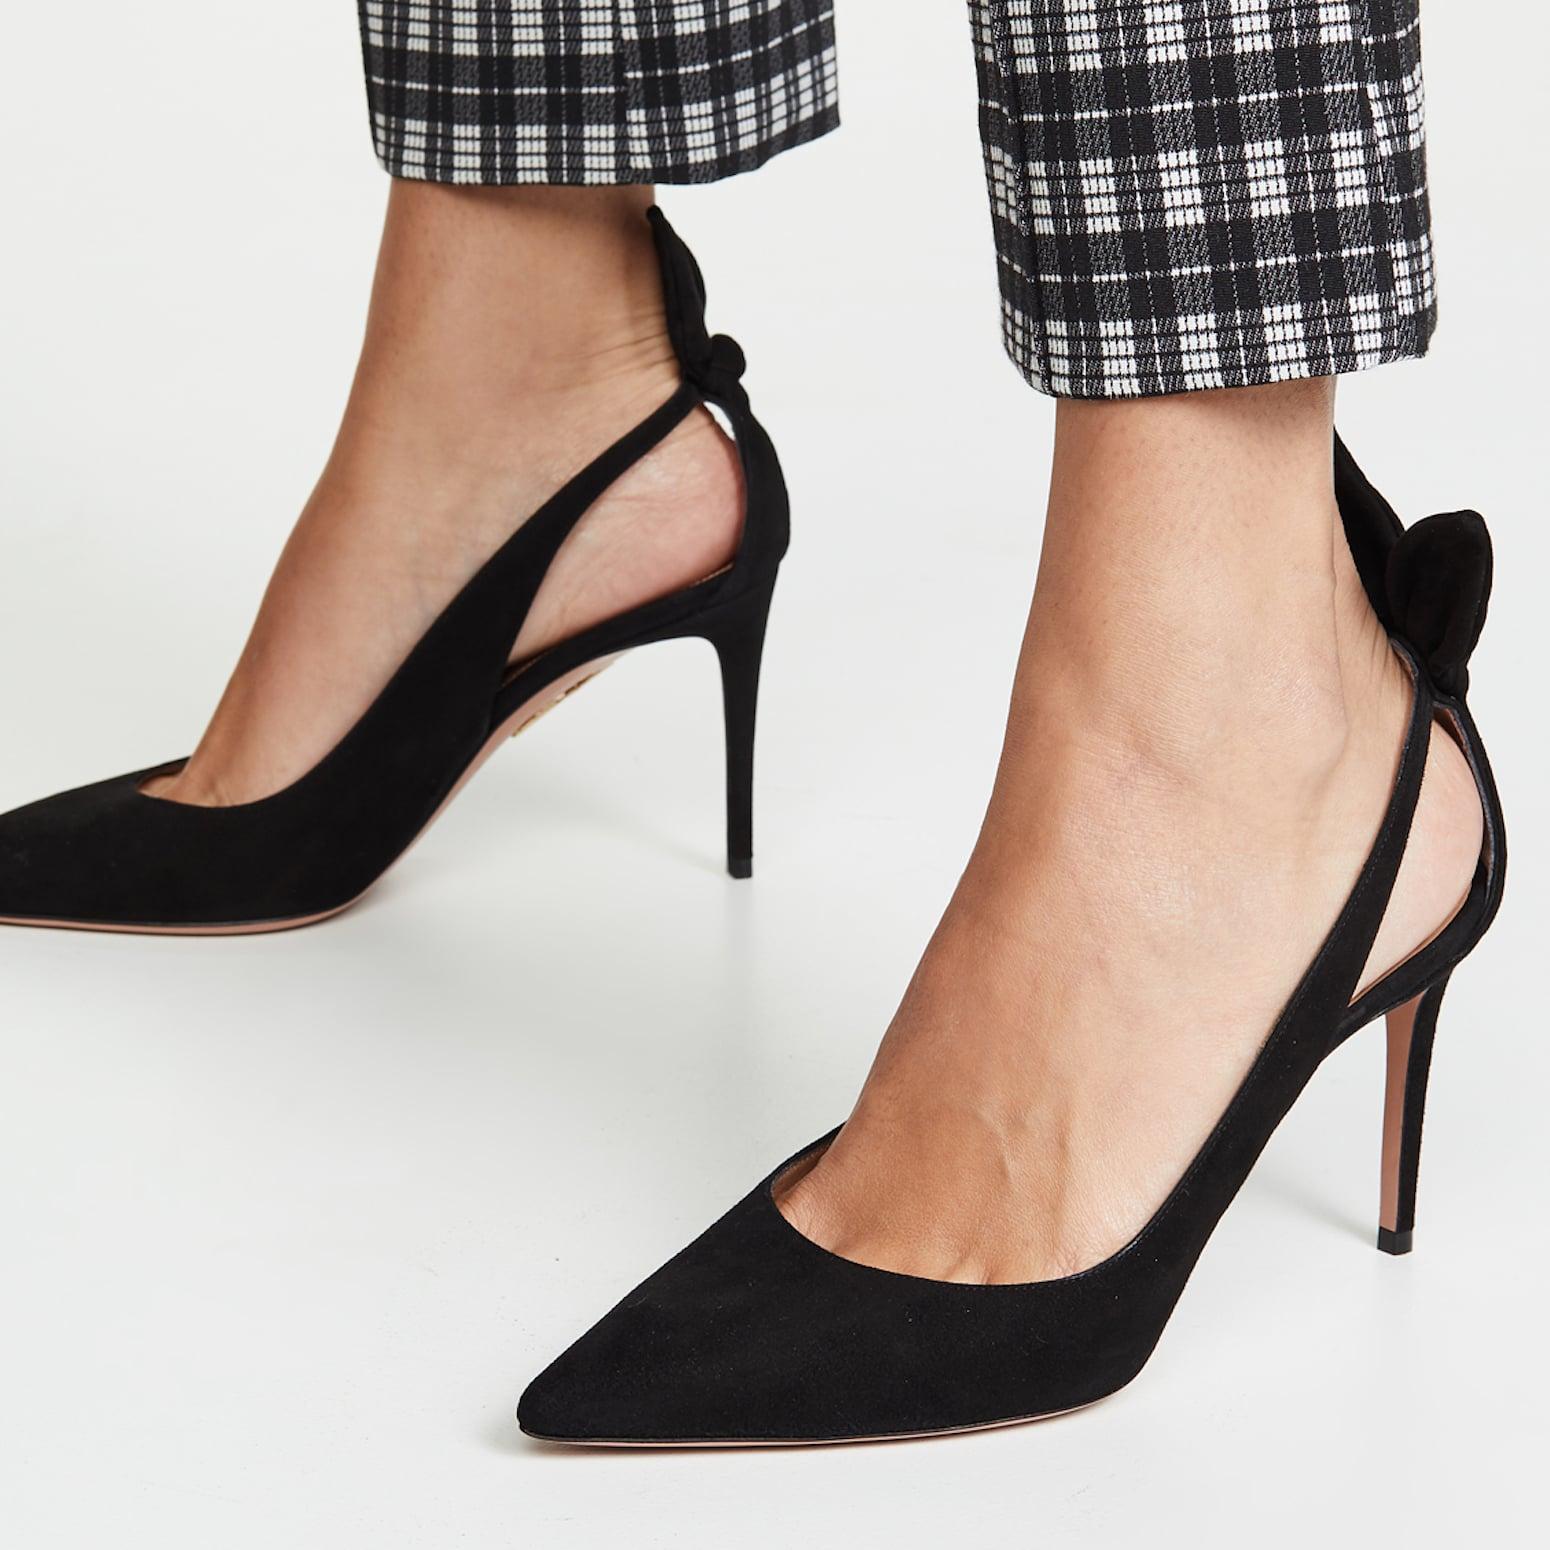 Best Black Heels For Women | POPSUGAR